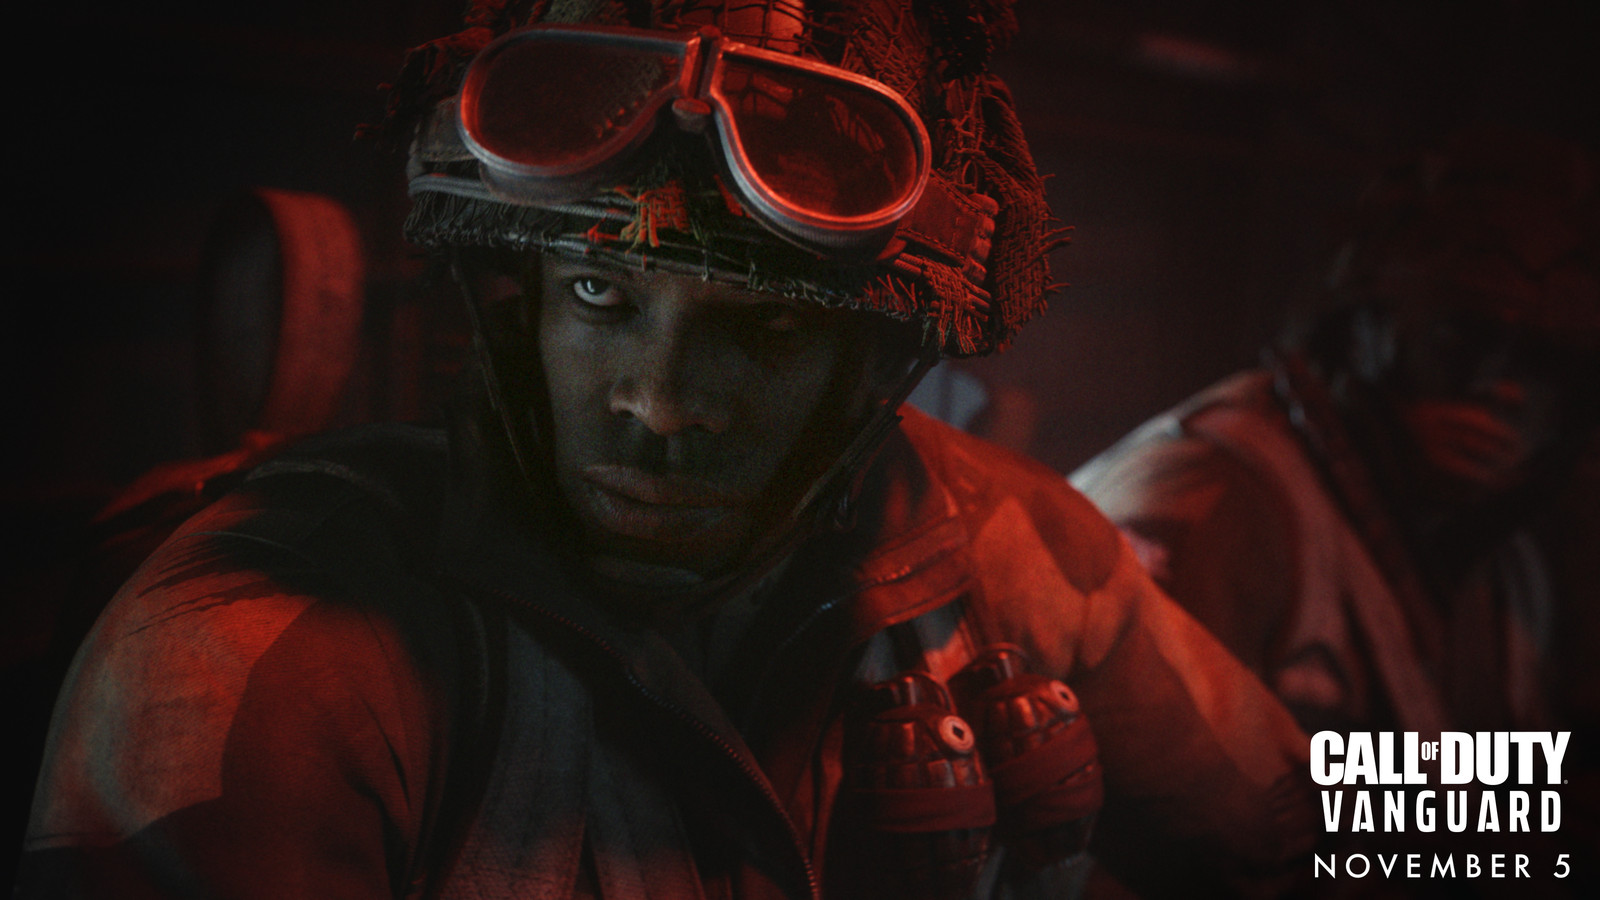 Call of Duty Announces New Anti-Cheat Initiative Called Ricochet